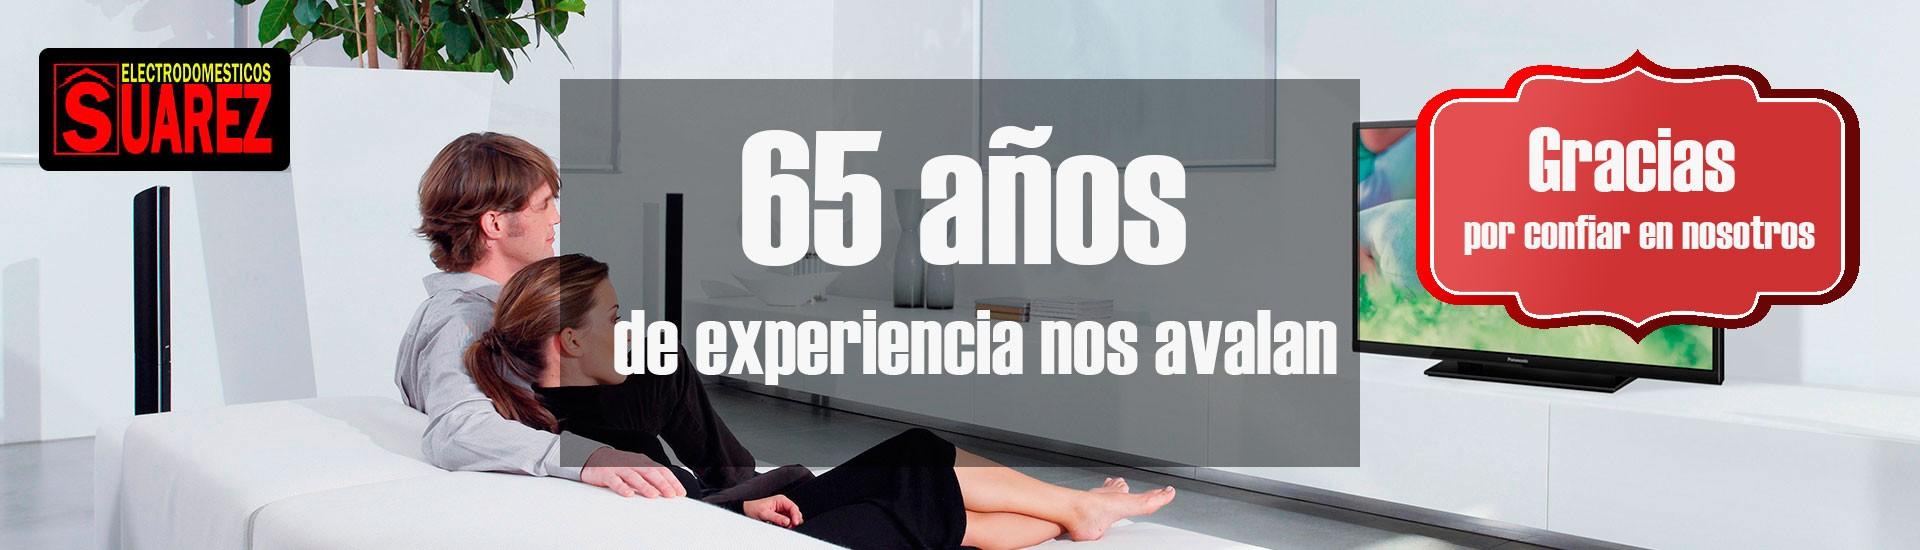 Ofertas Electrodomésticos Suárez - Granada